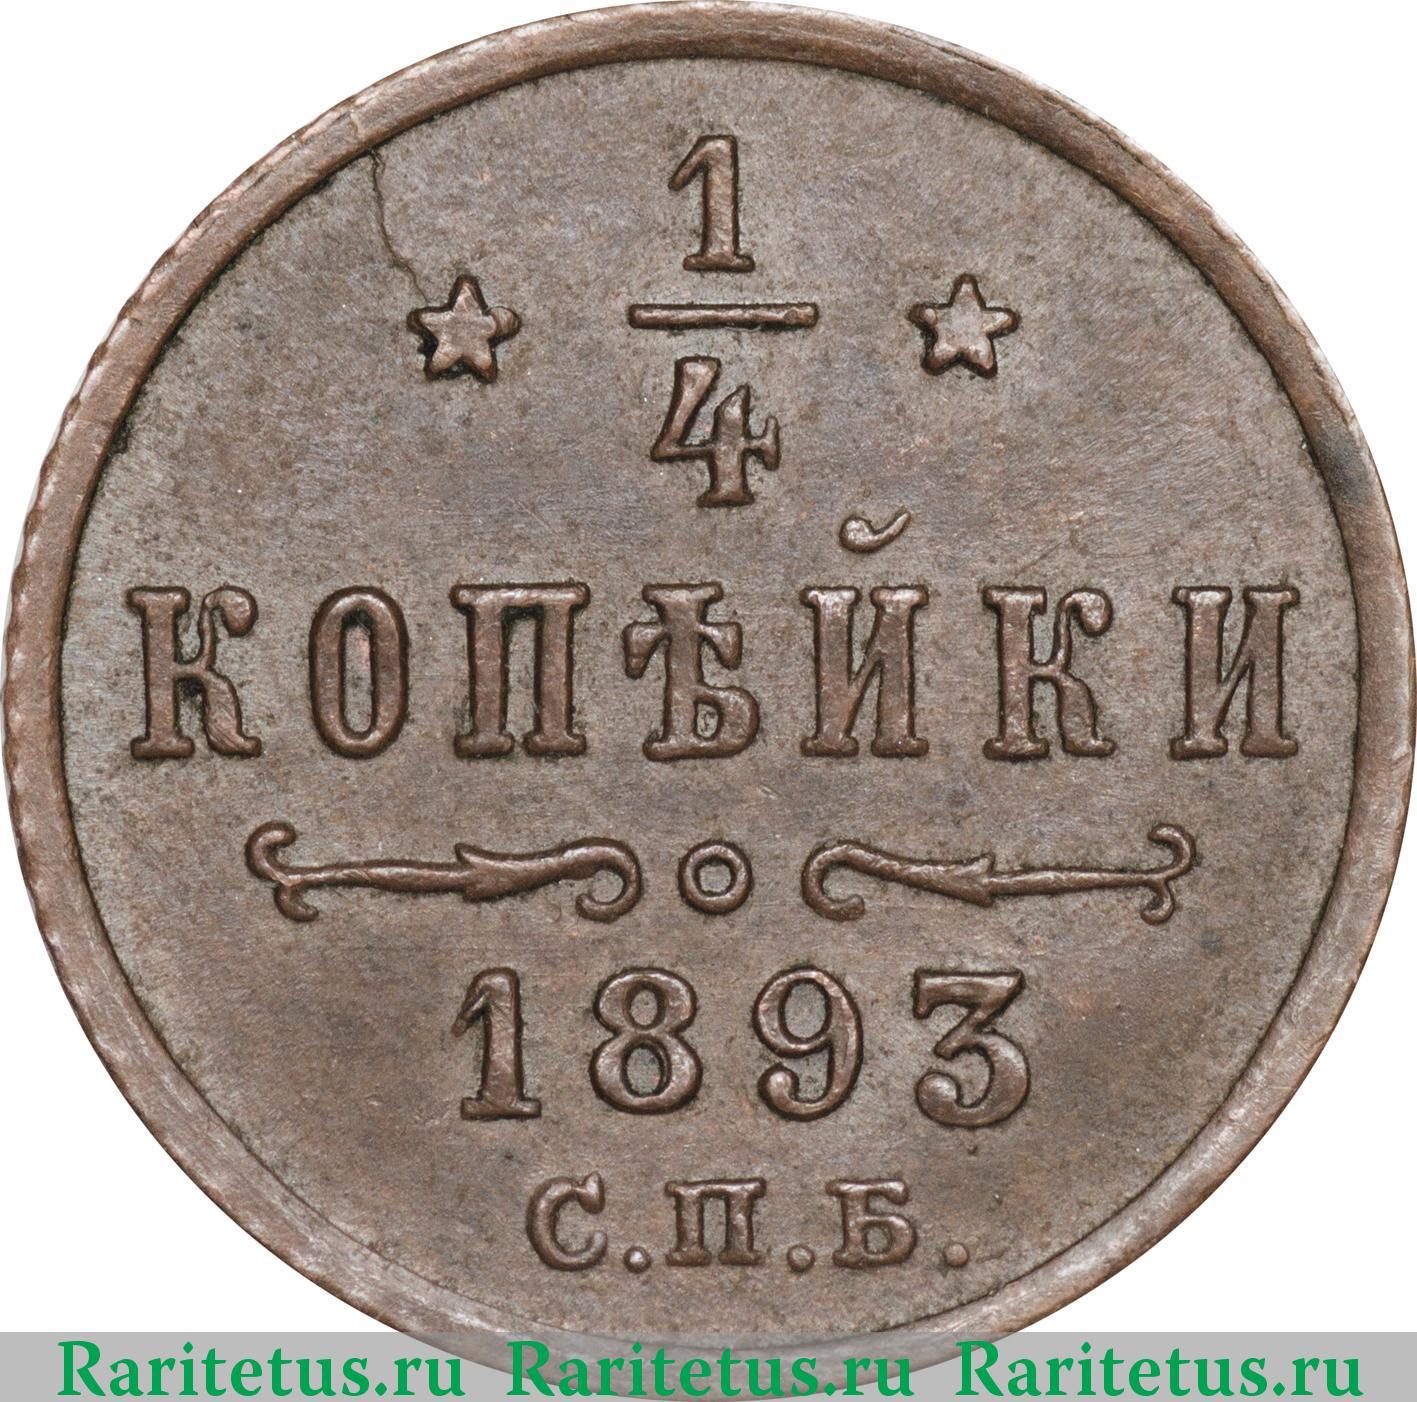 1/4 копейки 1893 г спб александр 3 монеты ссср рубли пруф